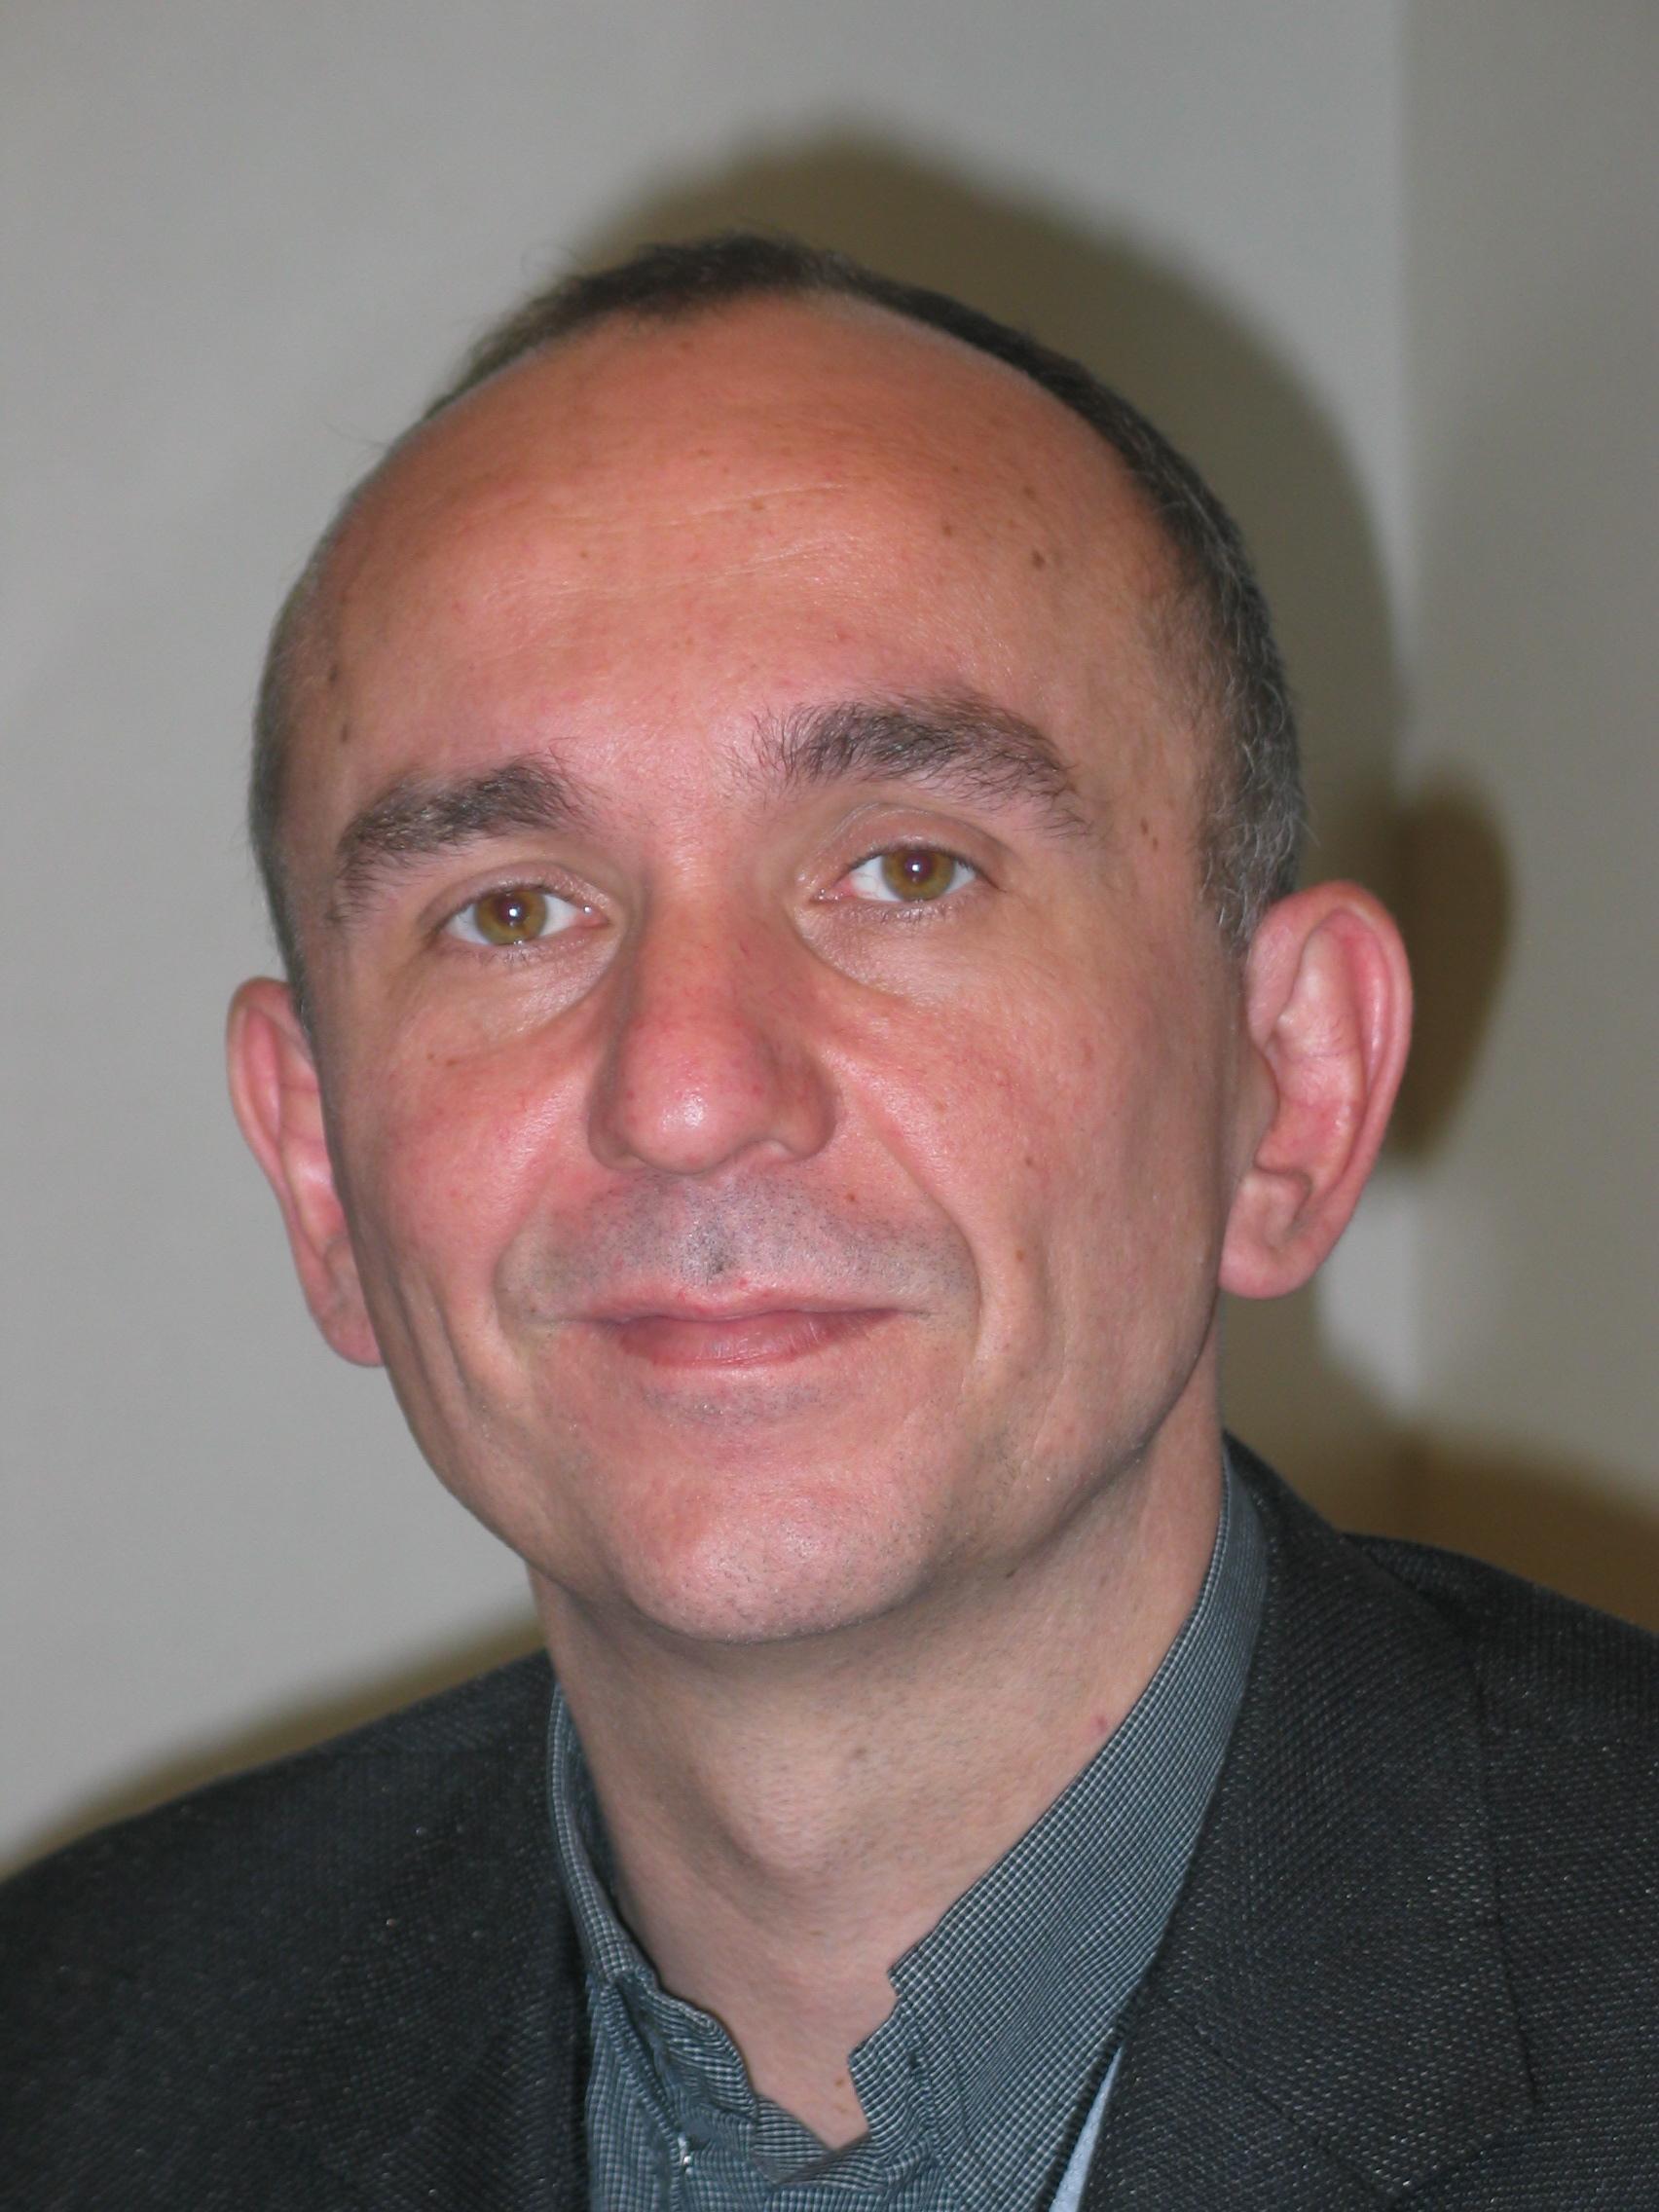 Peter Molyneux.